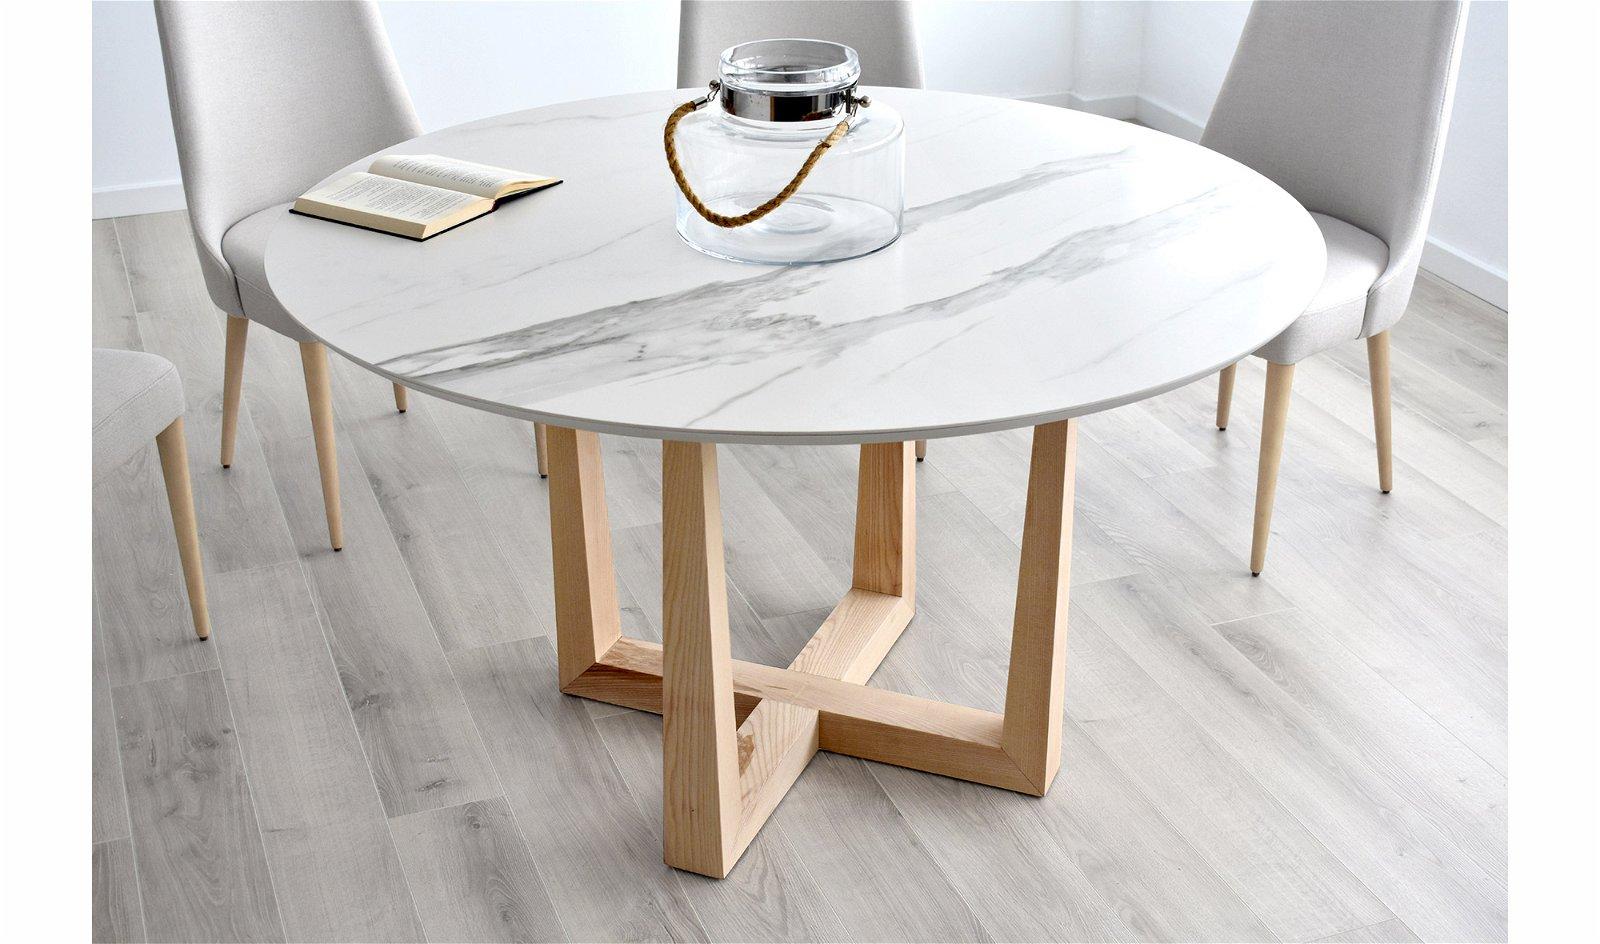 Mesa de comedor redonda porcelánico Ostein